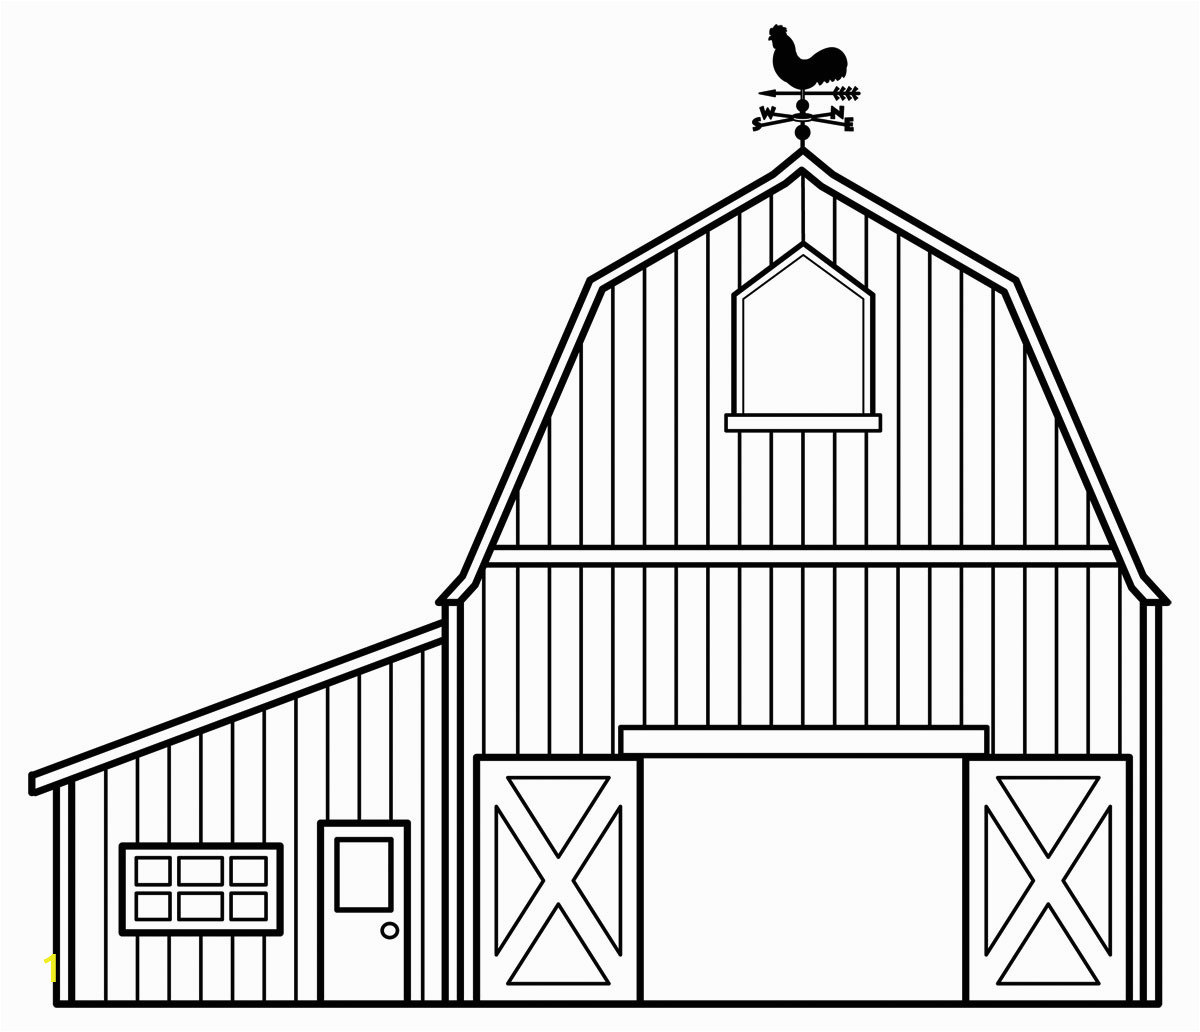 84d8a40bd31d42aeeecaf3306bbc79e0 barn outline cliparts free clip art free clip art 1200 1032